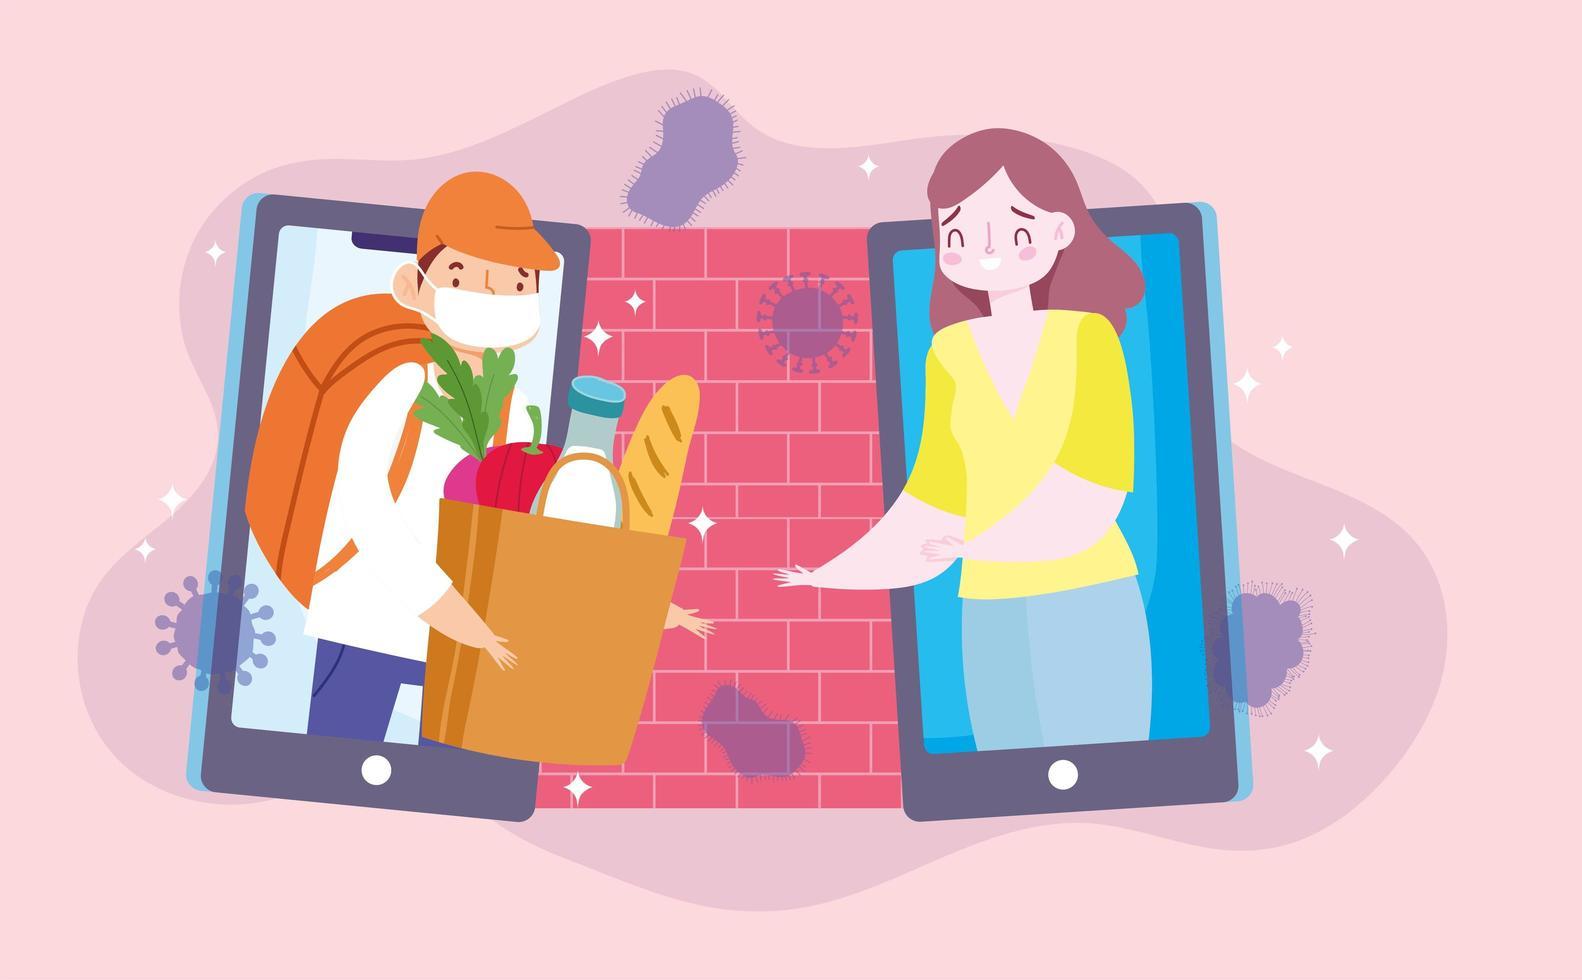 beställ mat online via smartphone vektor